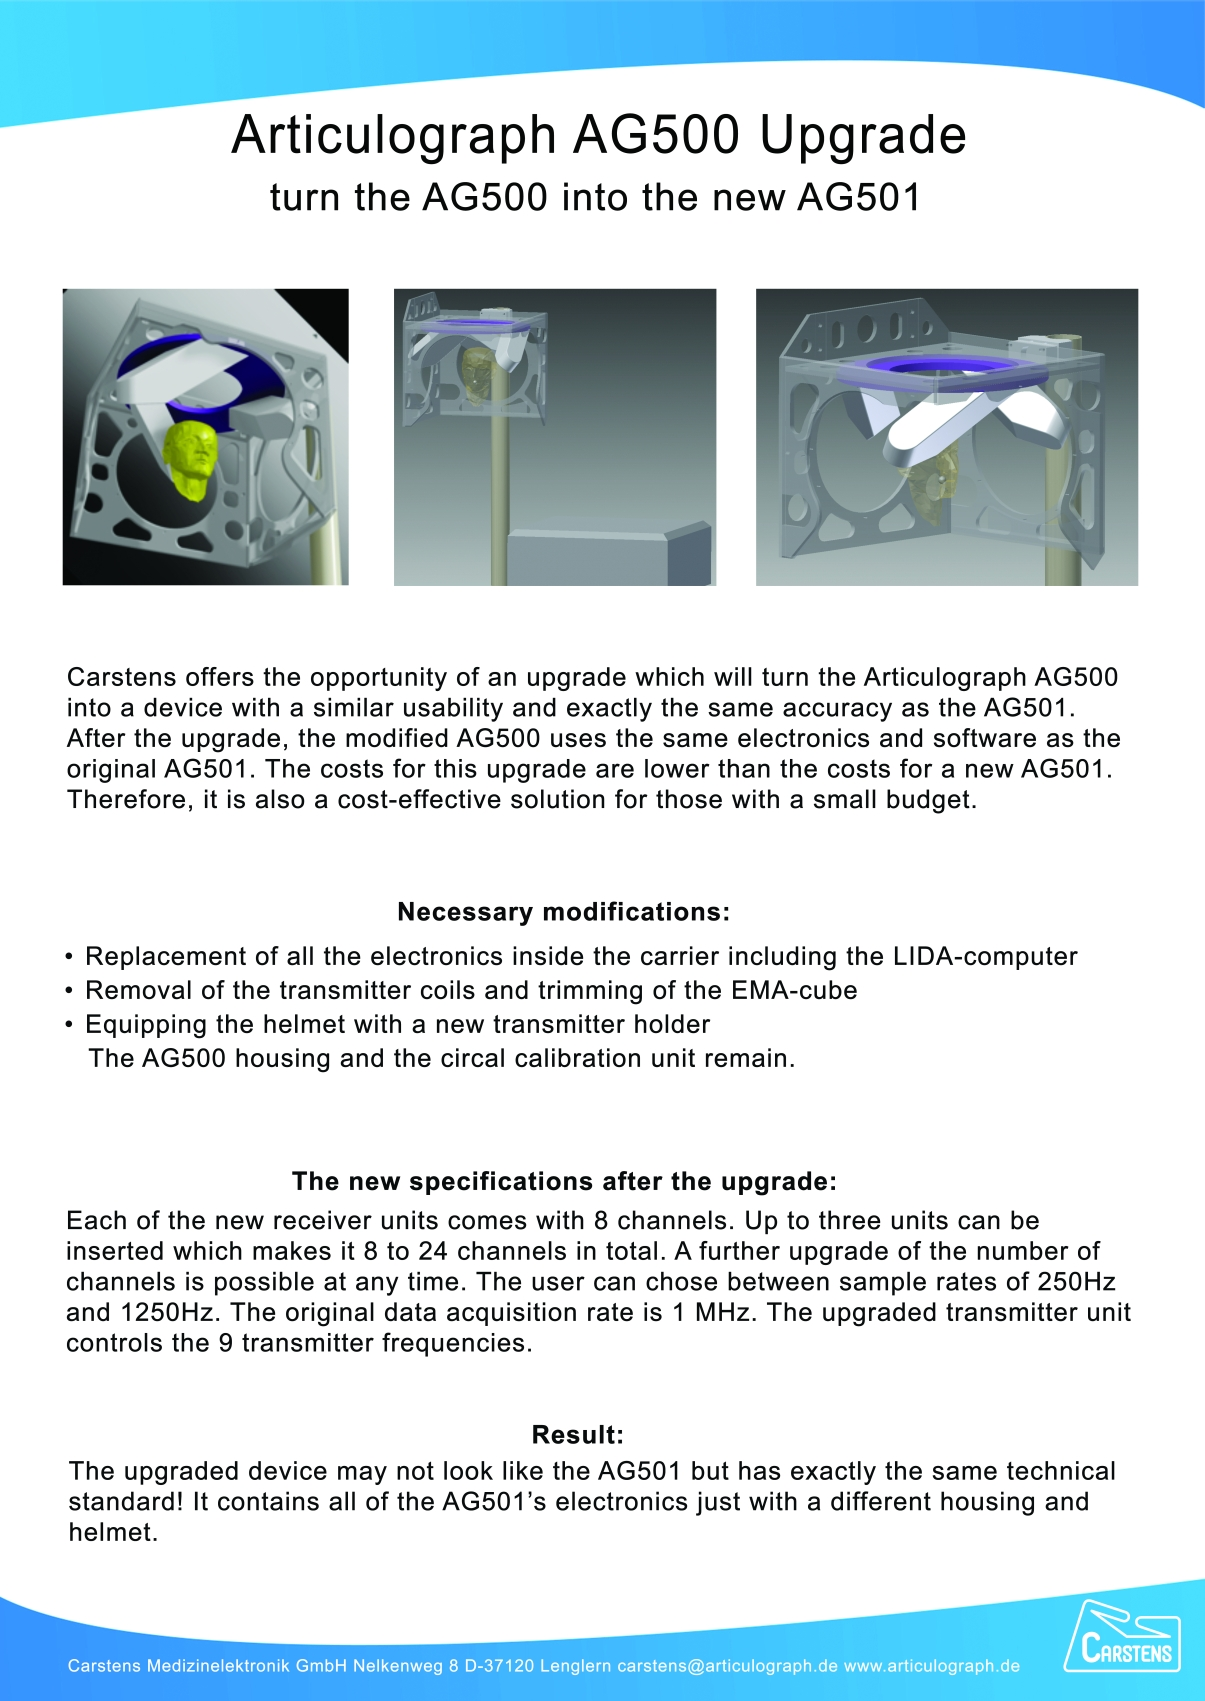 AG500 upgrade